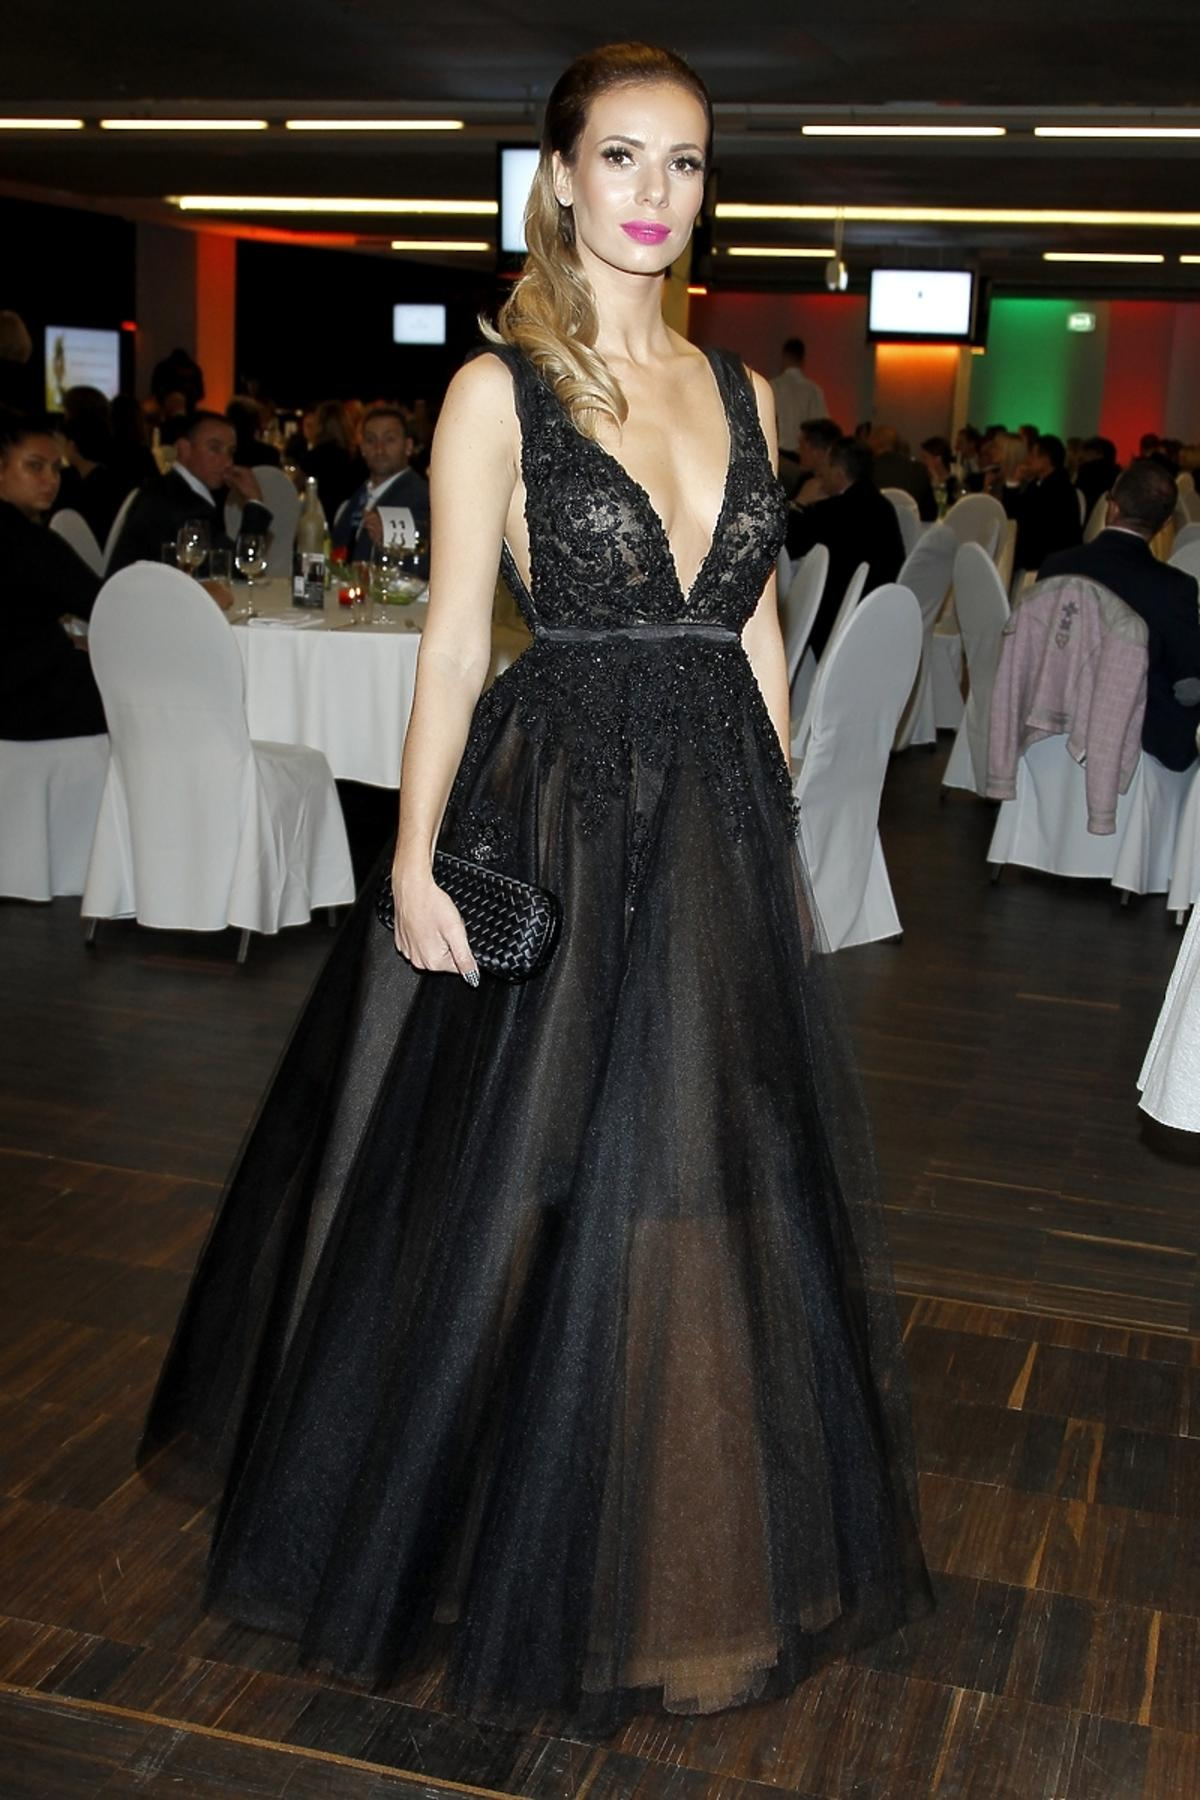 Izabela Janchowska na V Charytatywnej Gali Sportu i Biznesu